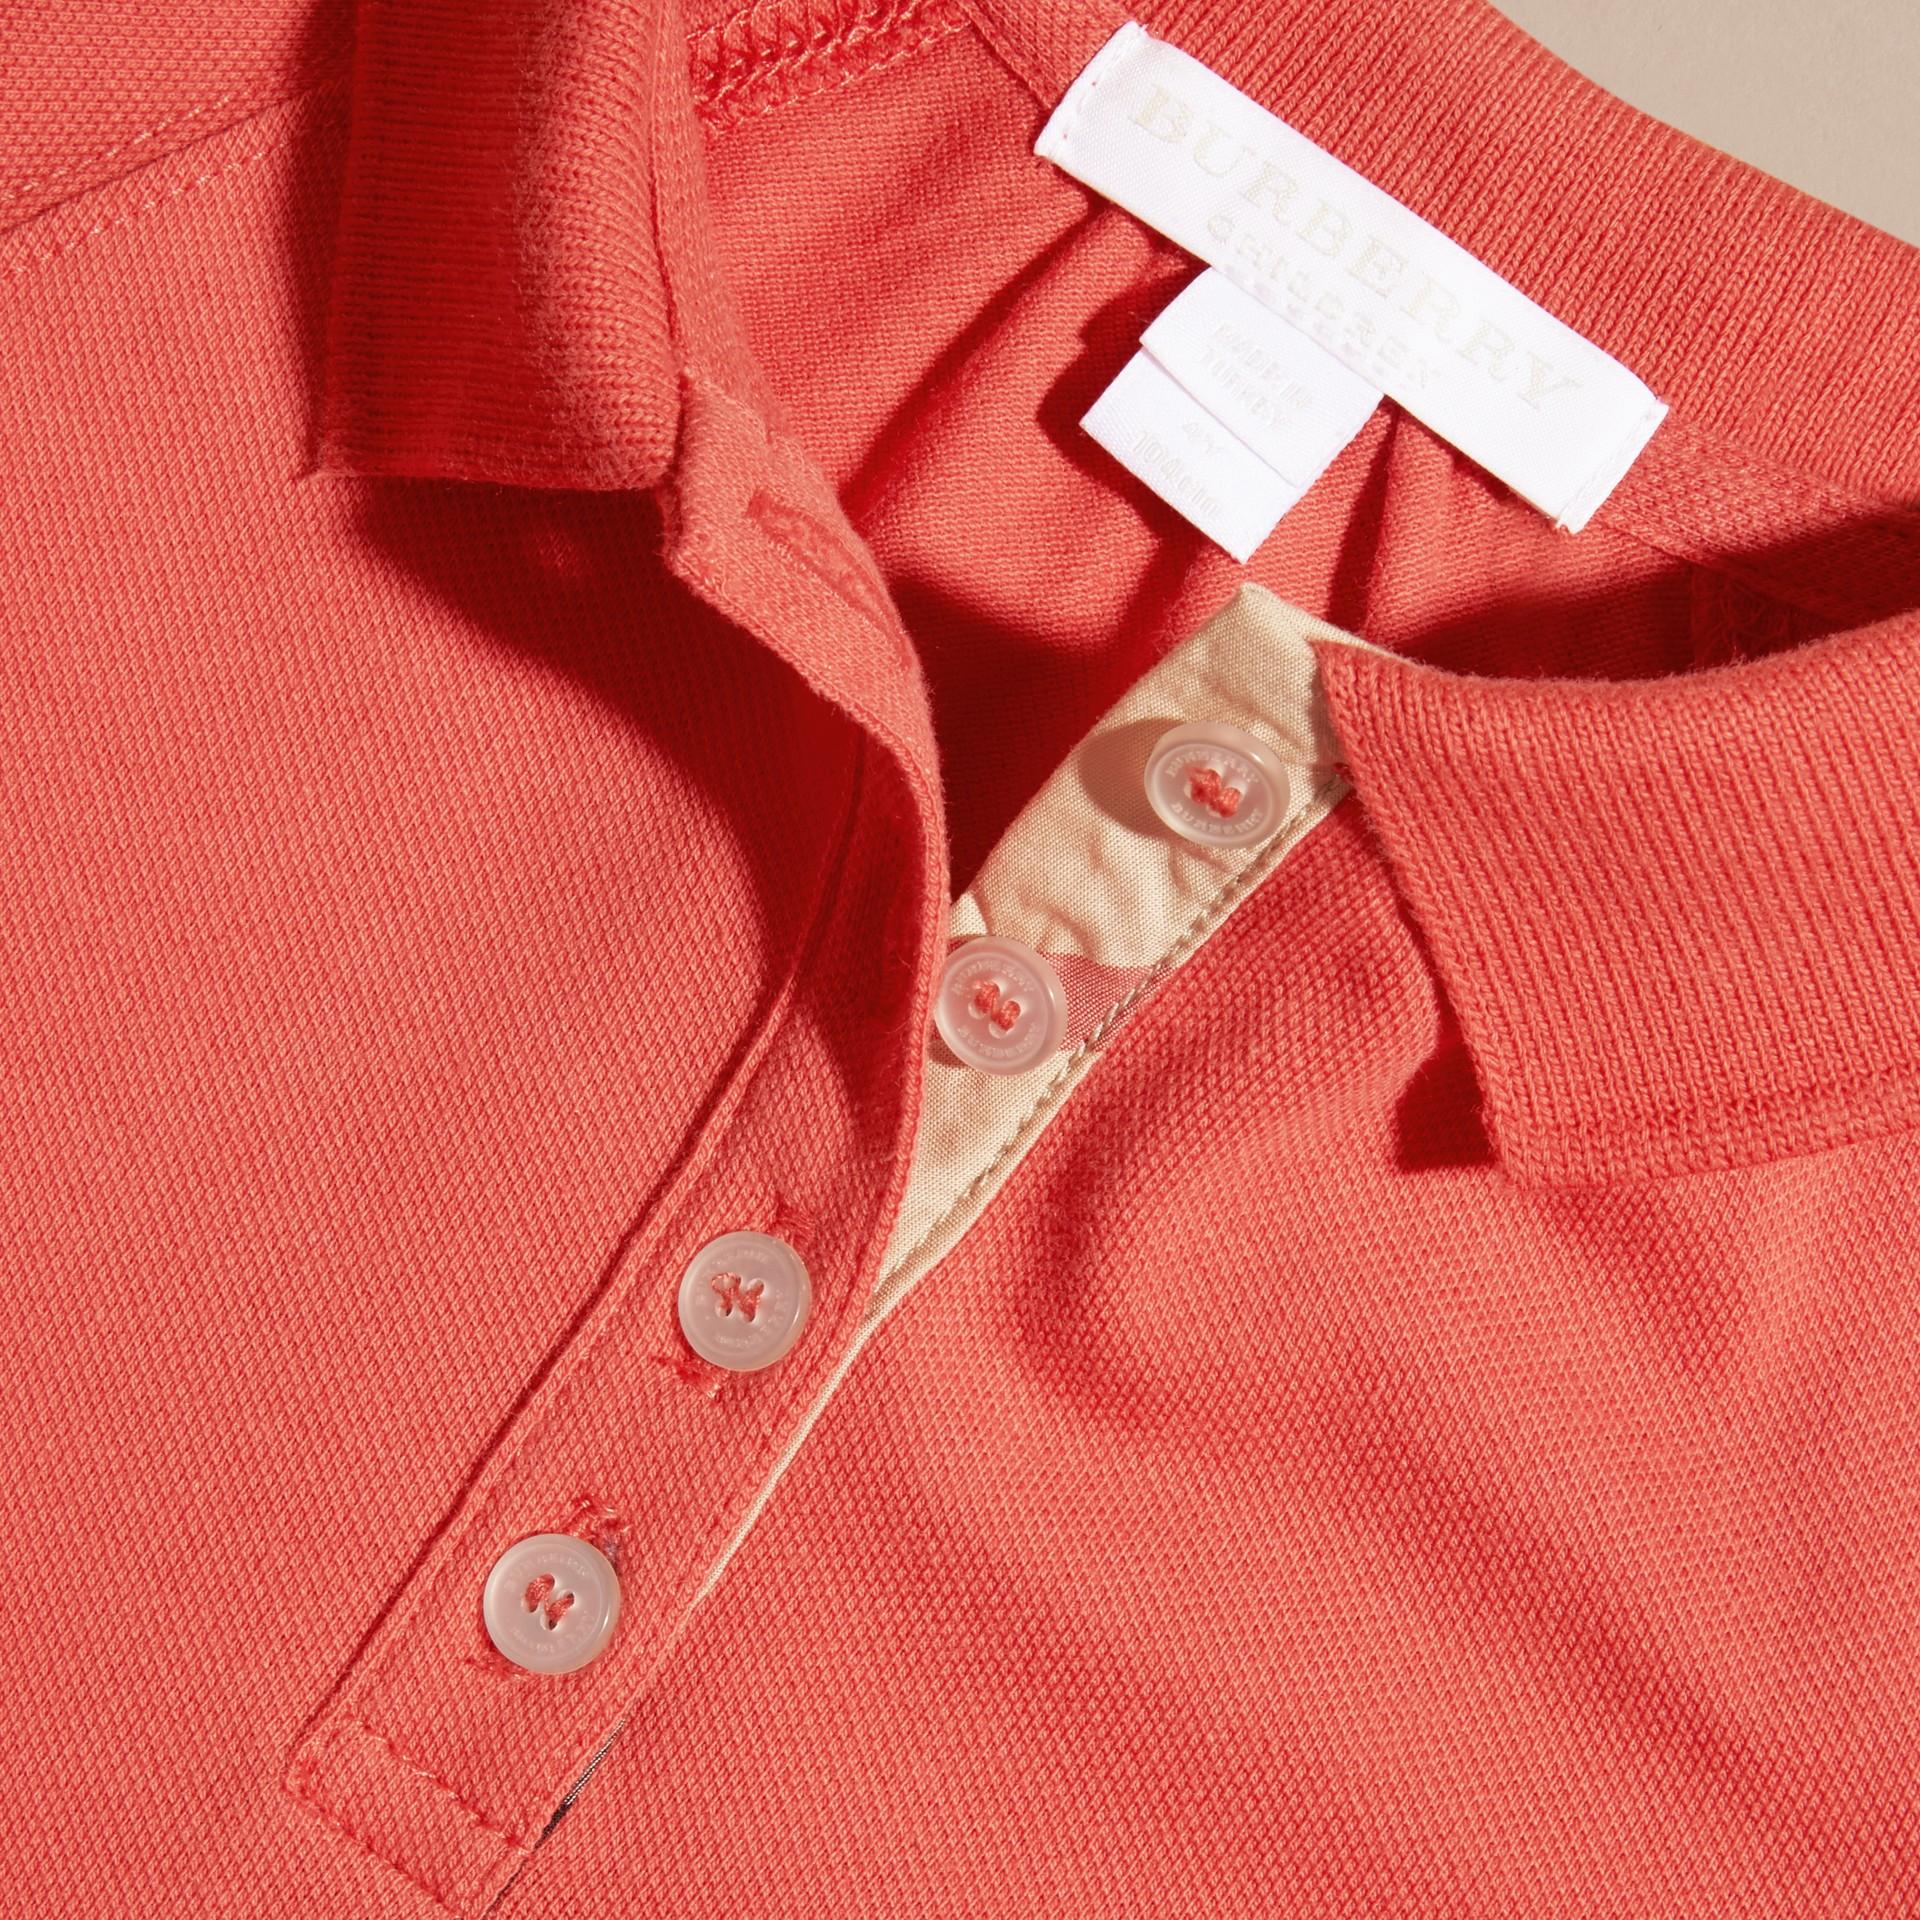 Check Placket Cotton Blend T-Shirt Dress - gallery image 2